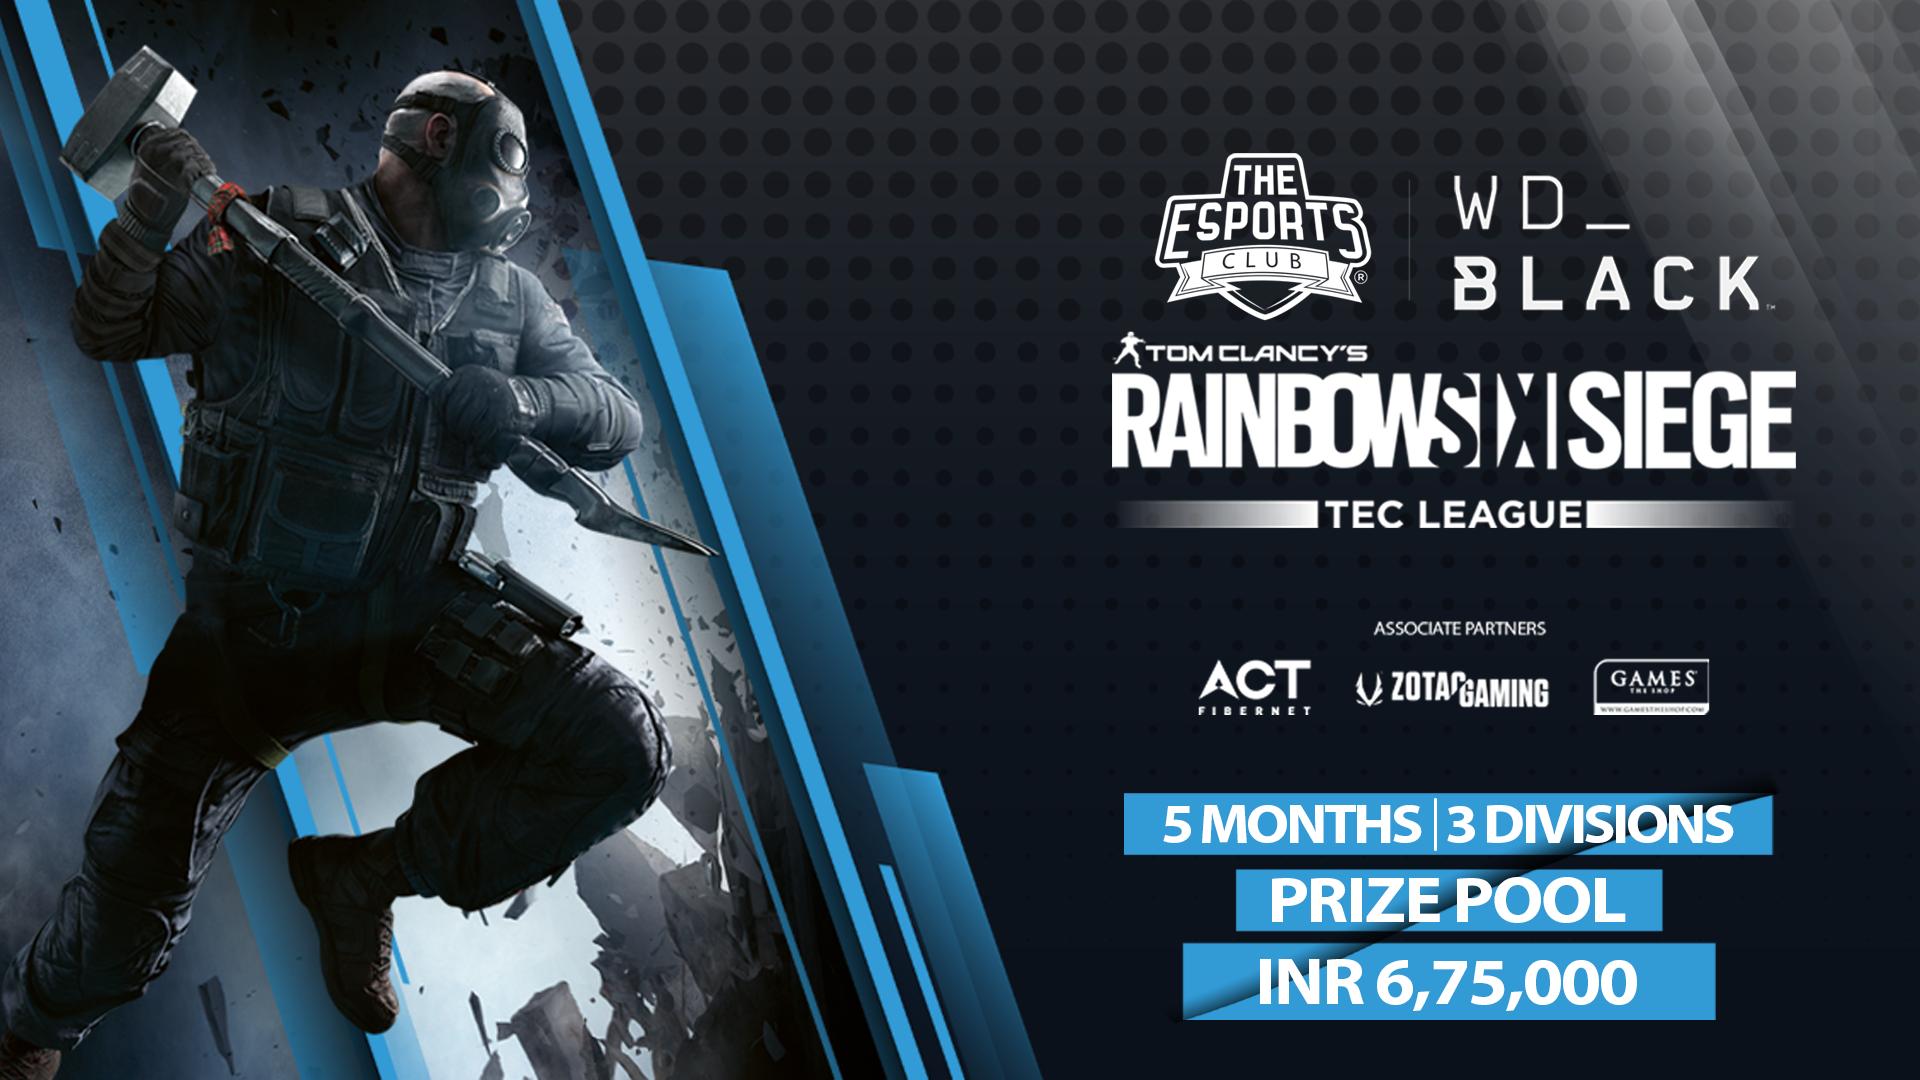 TEC RainbowSix Siege League